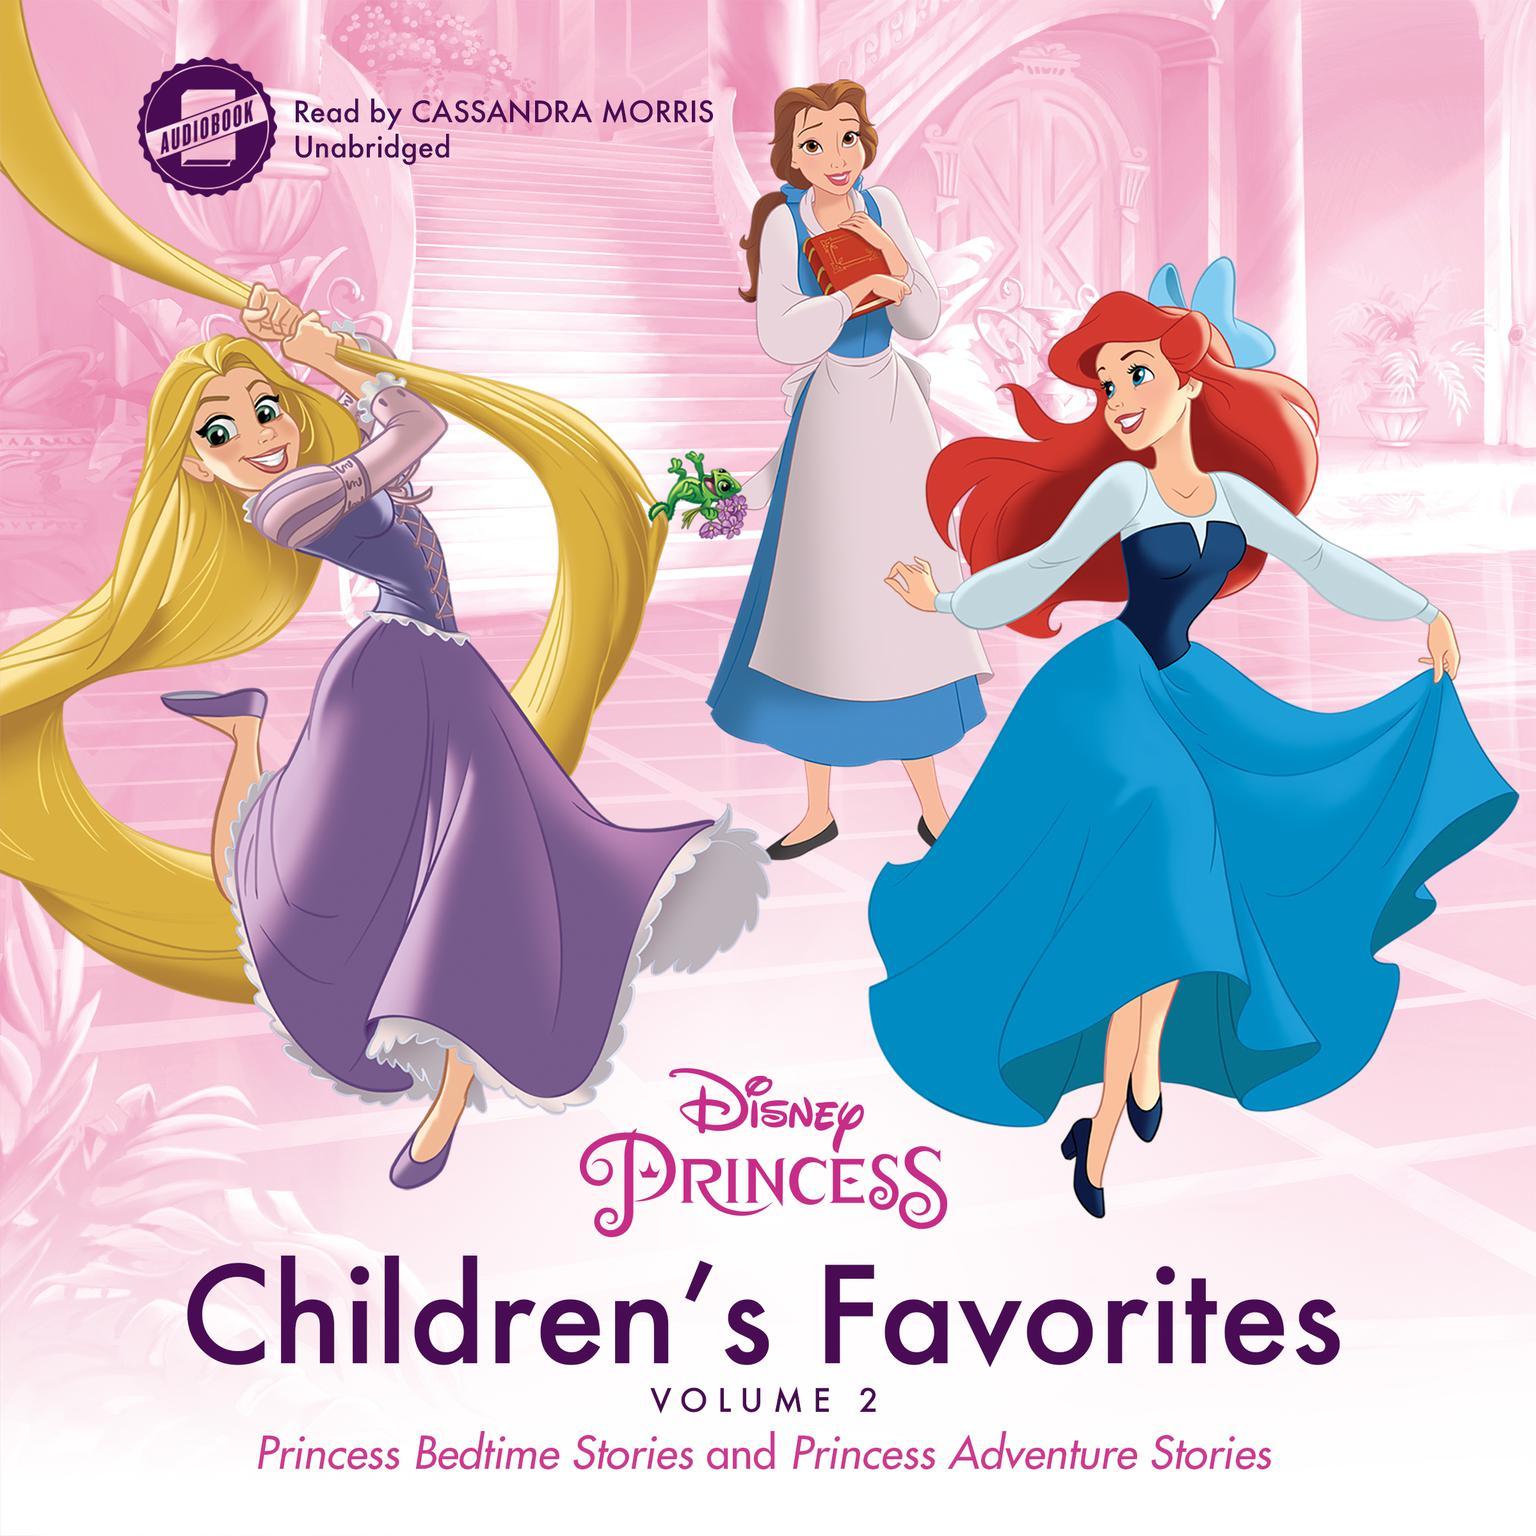 Children's Favorites, Vol. 2: Princess Bedtime Stories and Princess Adventure Stories Audiobook, by Disney Press